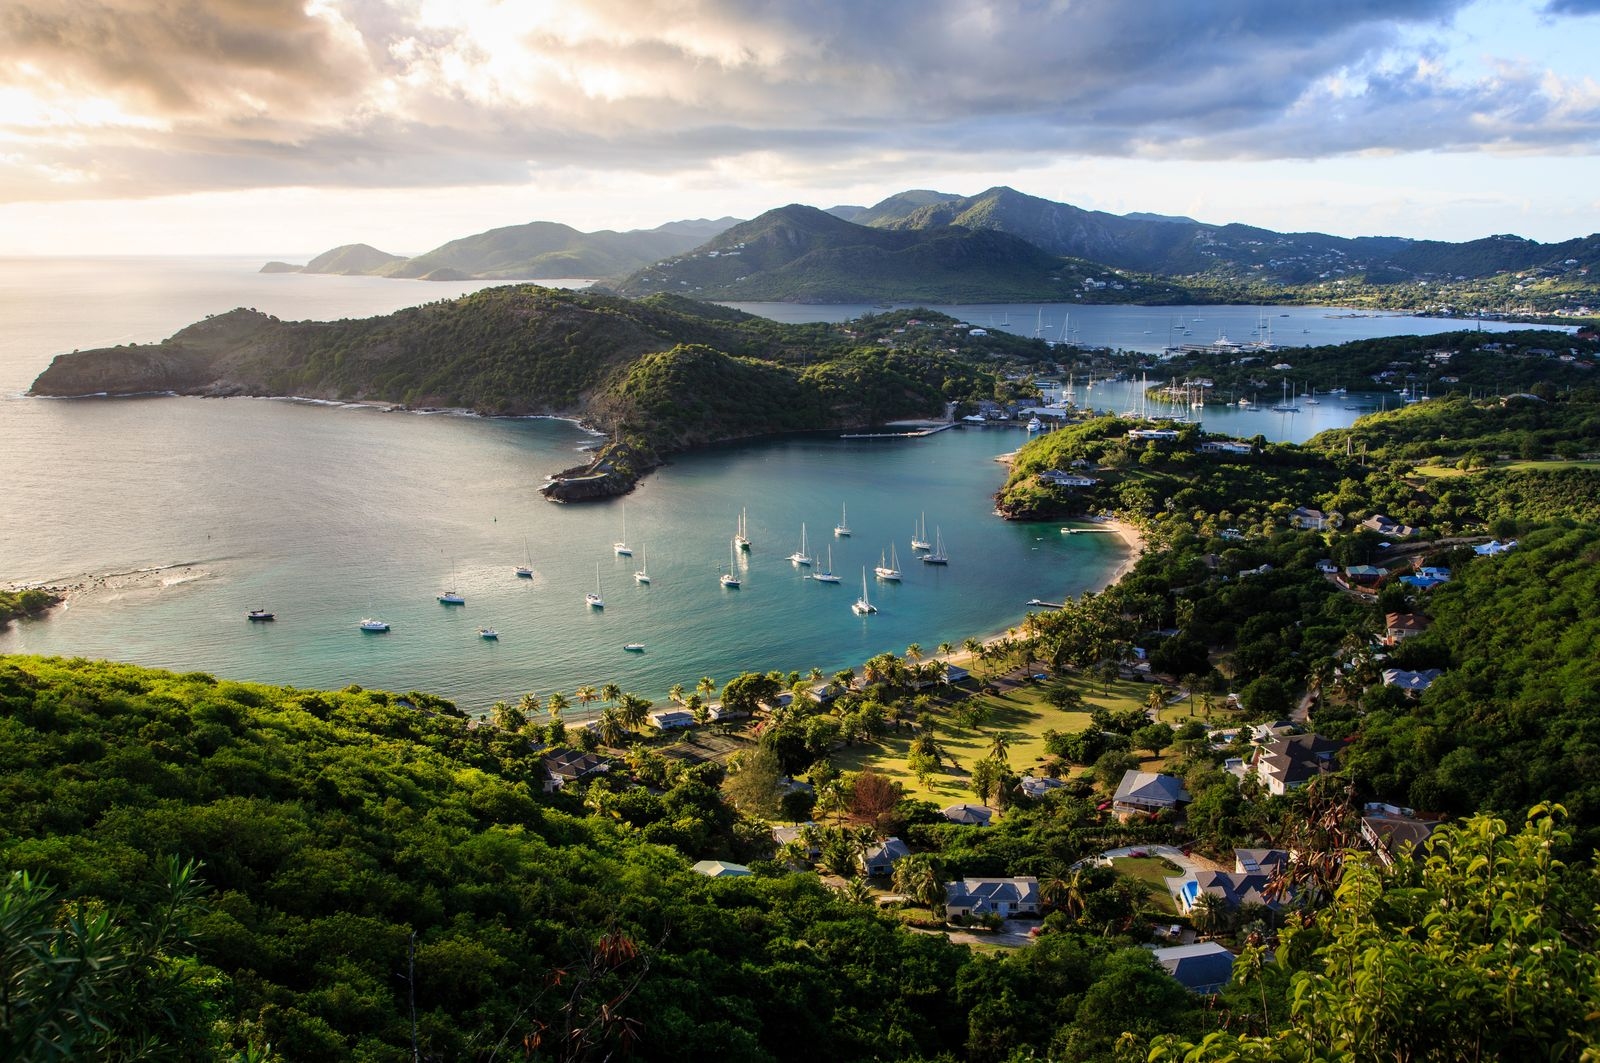 500px Photo ID: 89752753 - View overlooking English Harbor, Antigua & Barbuda